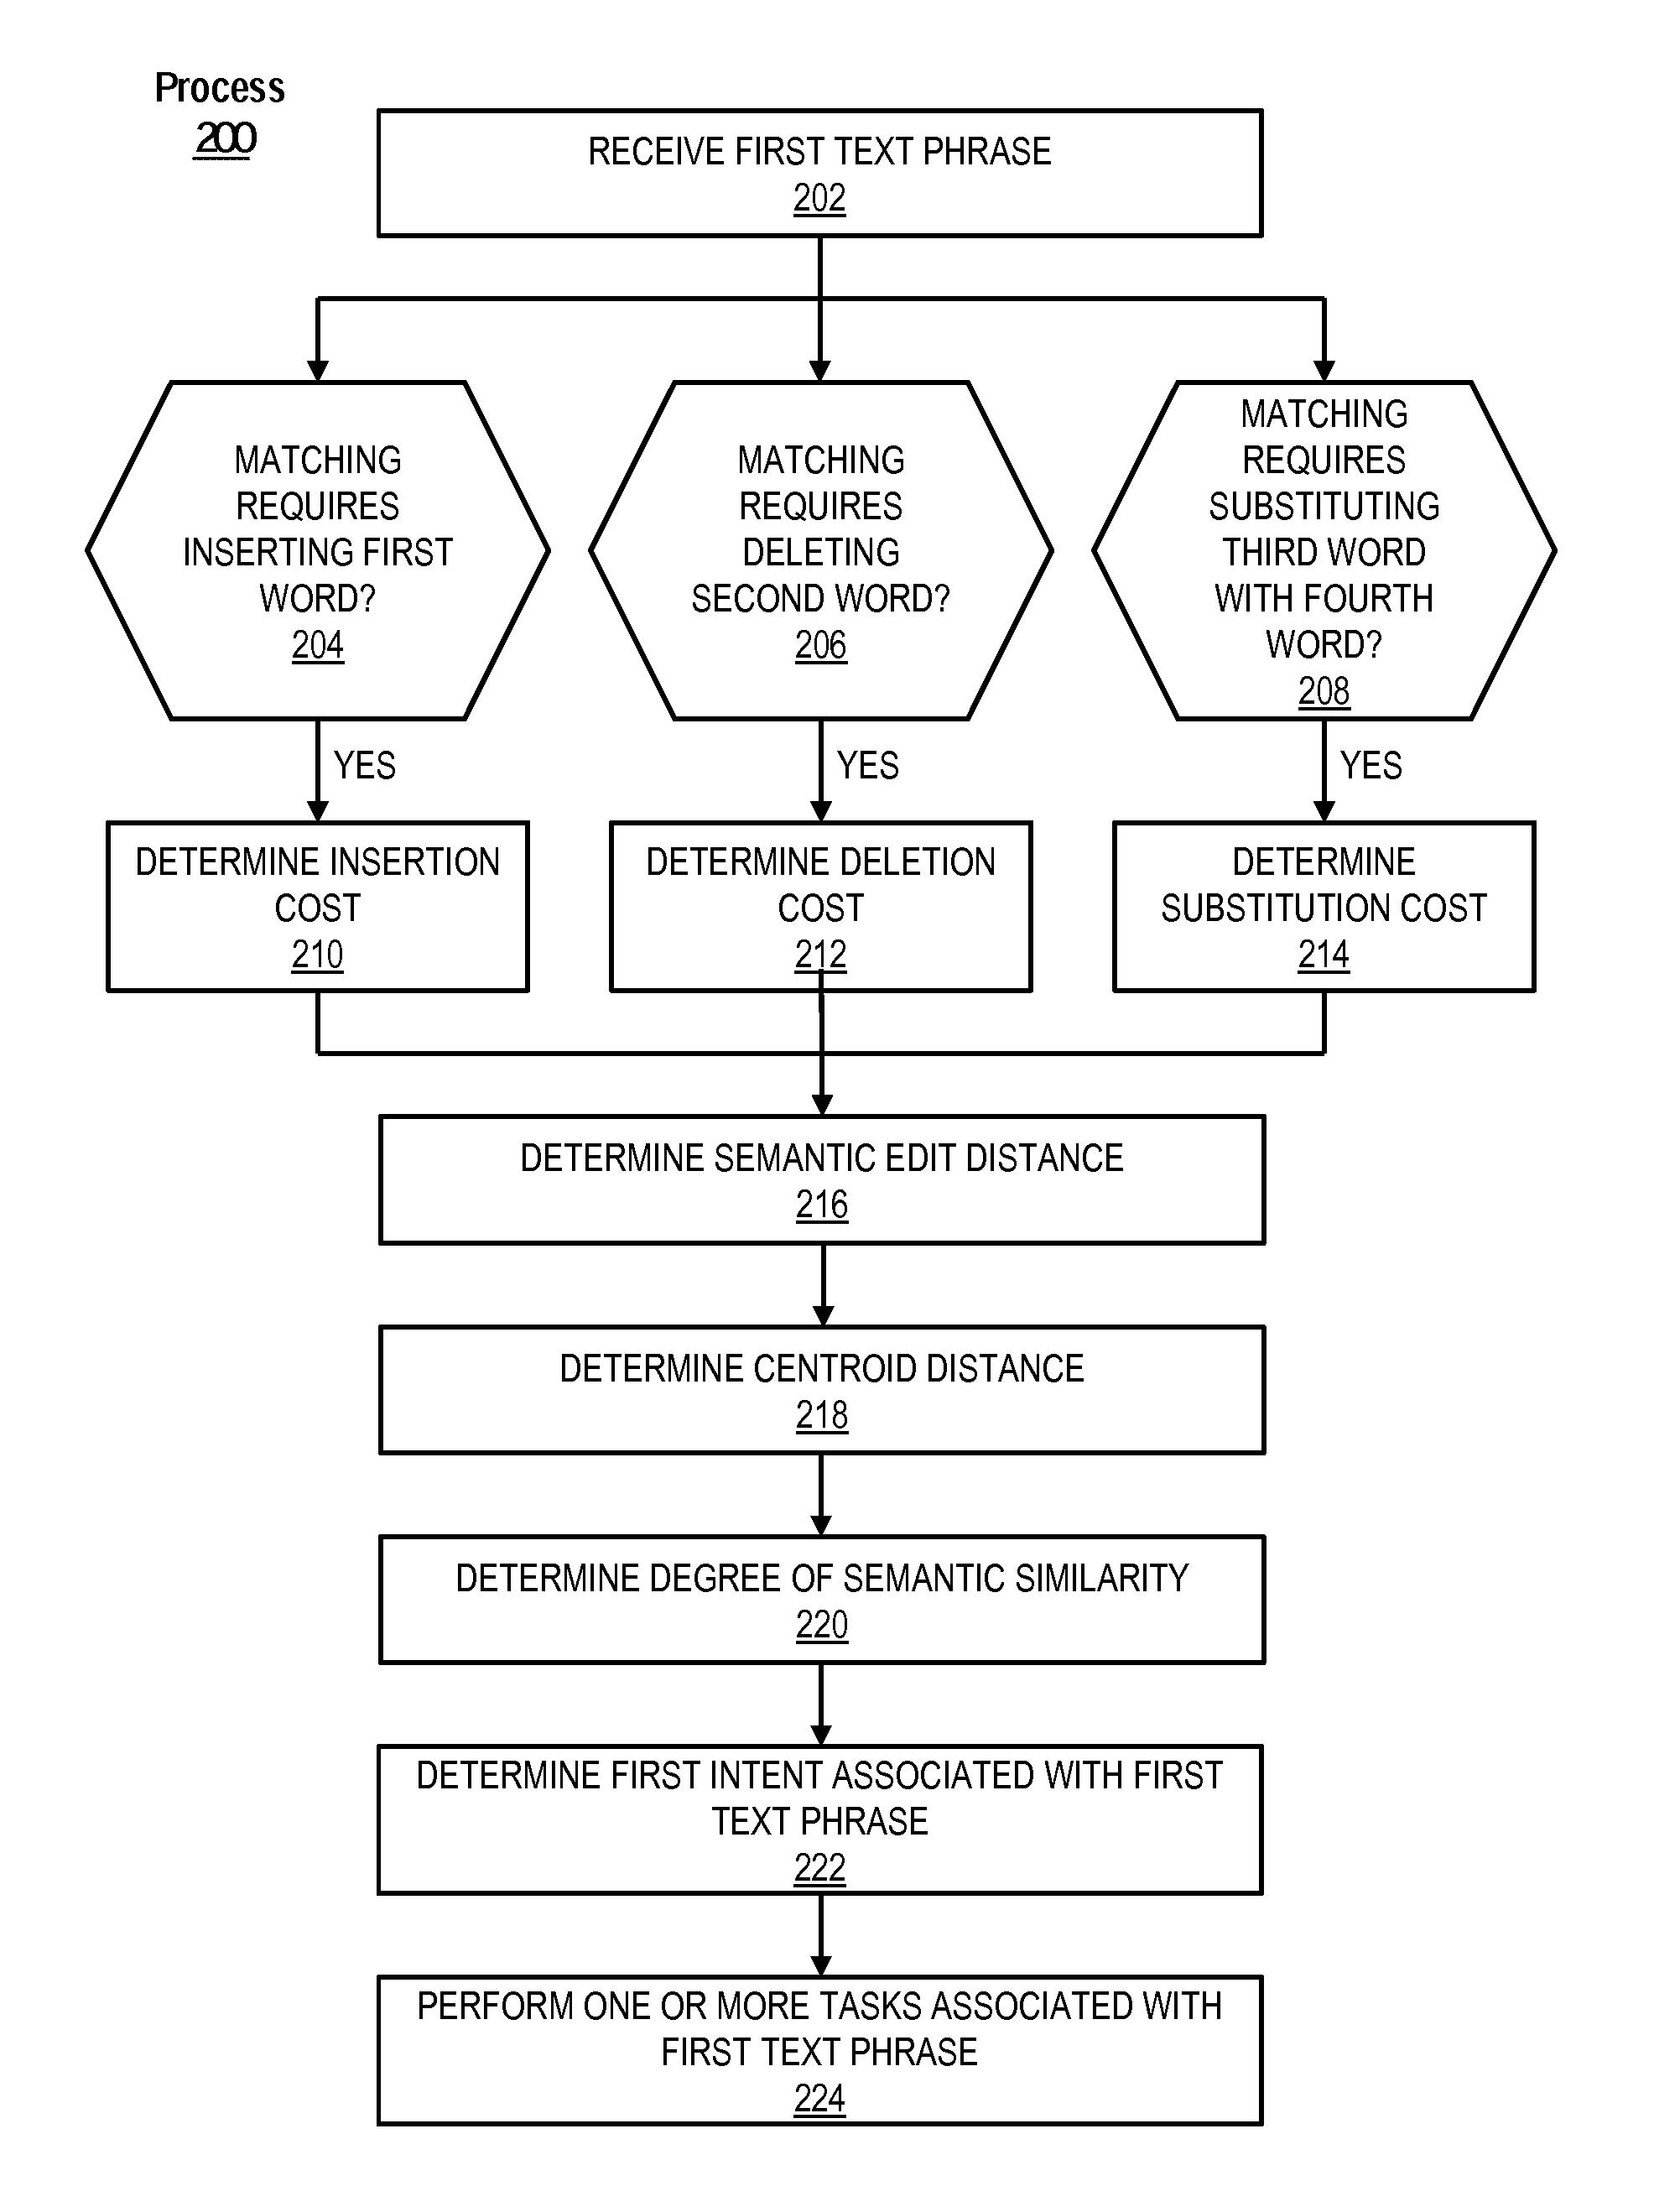 Patent US 9,430,463 B2